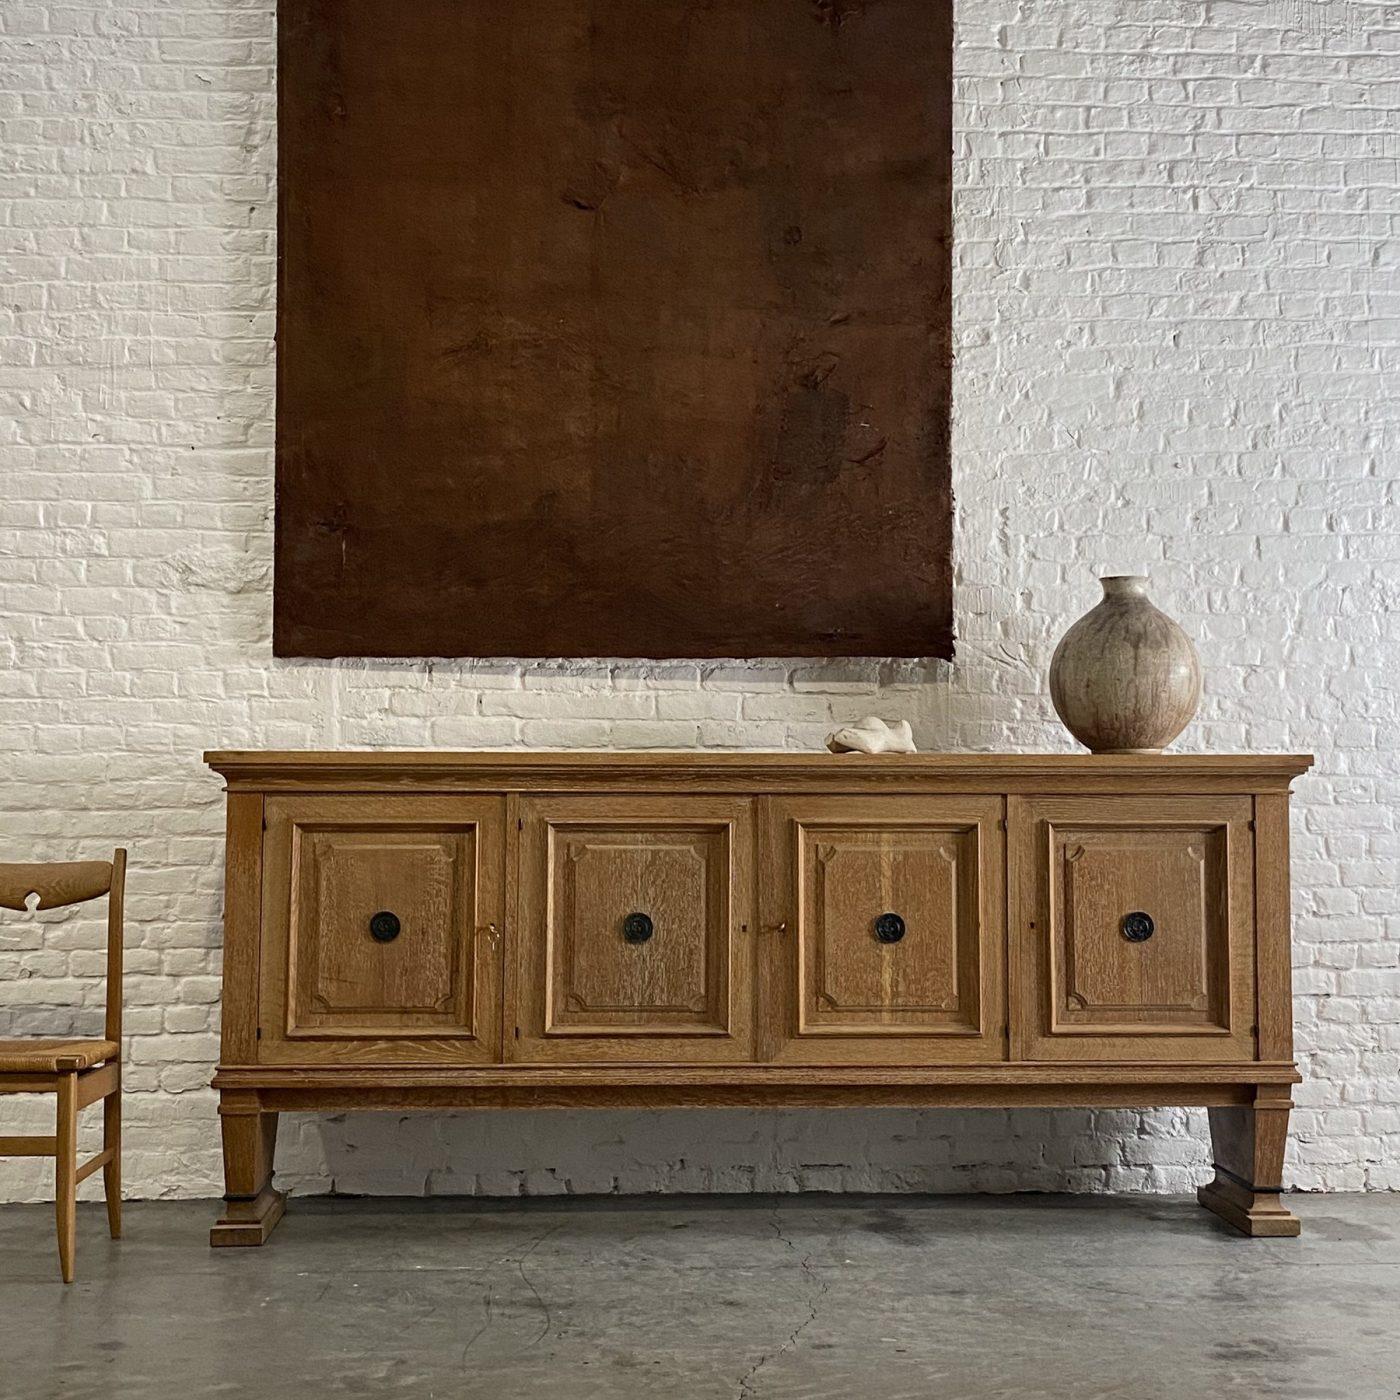 objet-vagabond-oak-sideboard0005